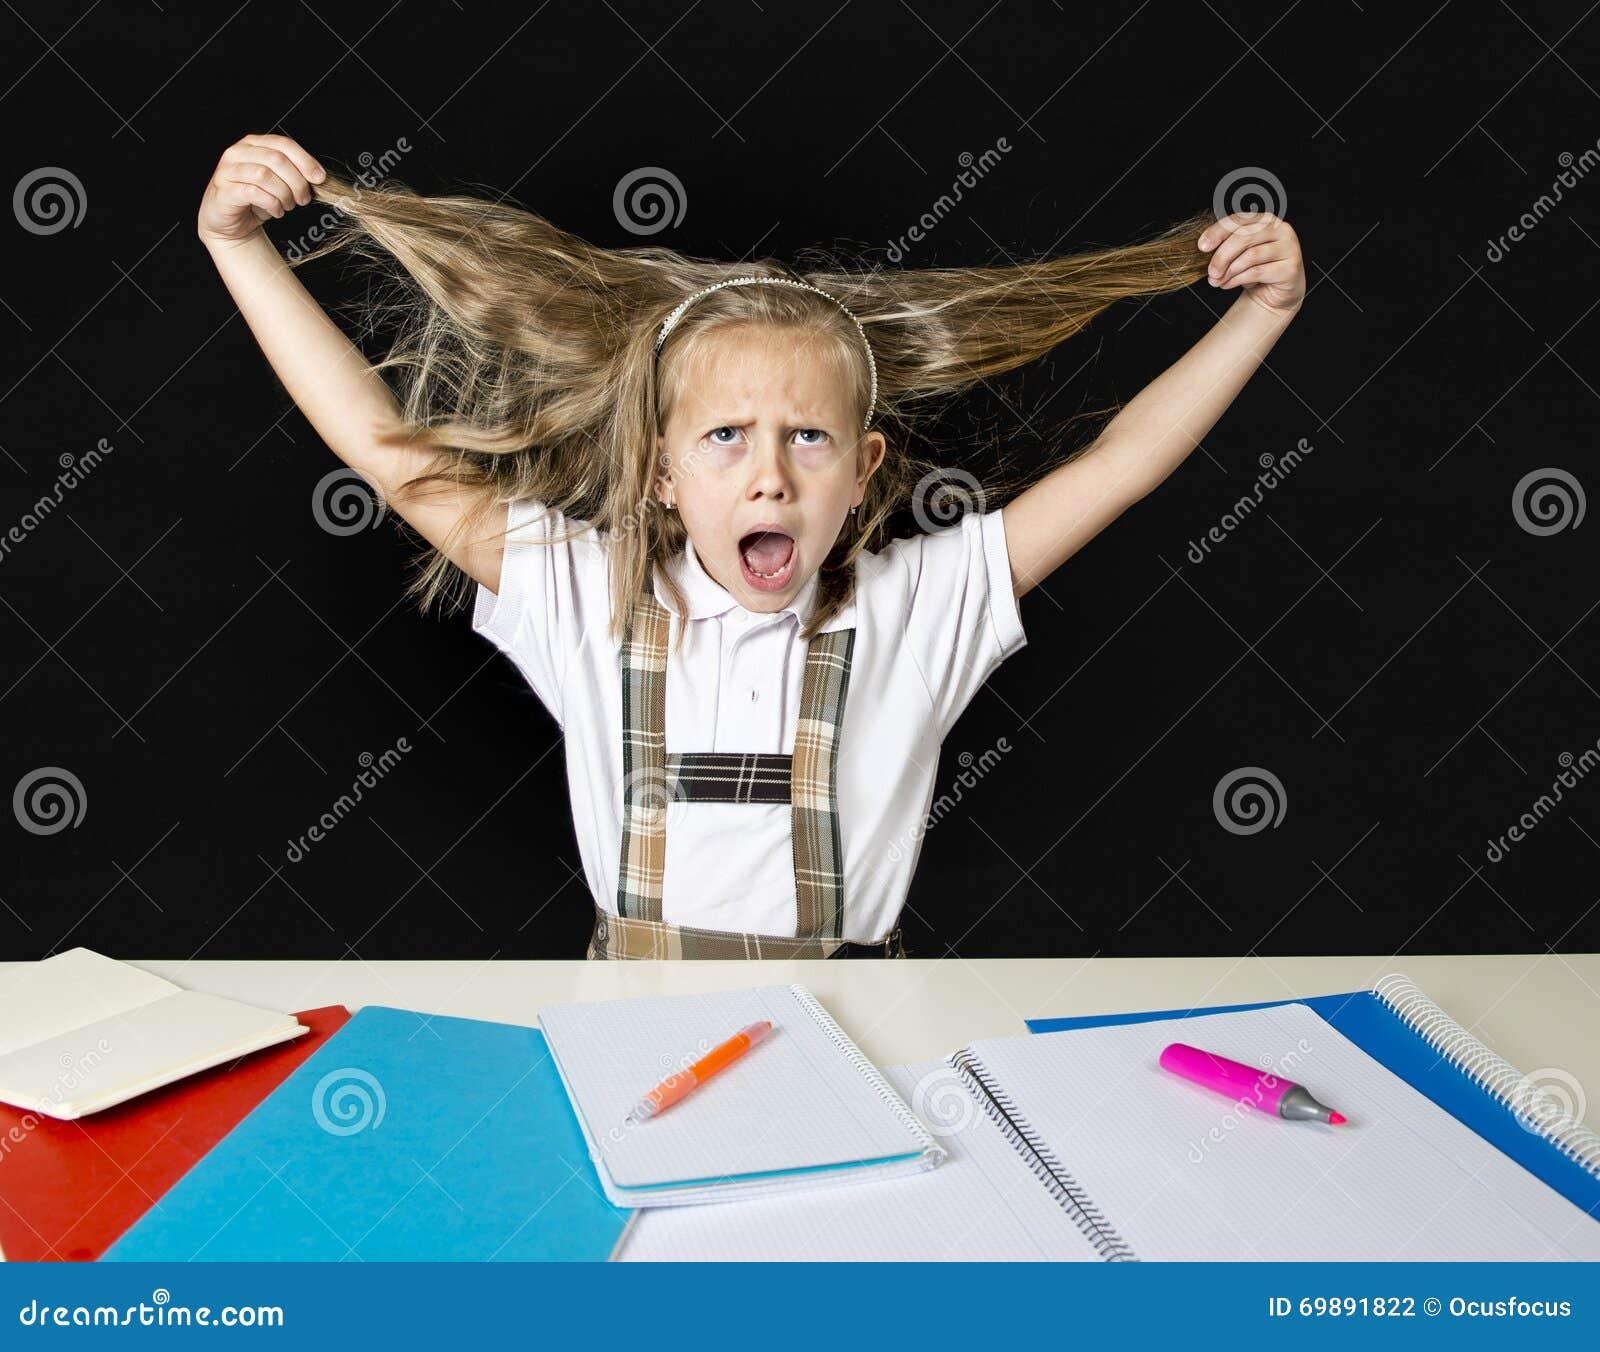 Crazy junior schoolgirl sitting on desk in stress working doing homework pulling her blond hair crazy